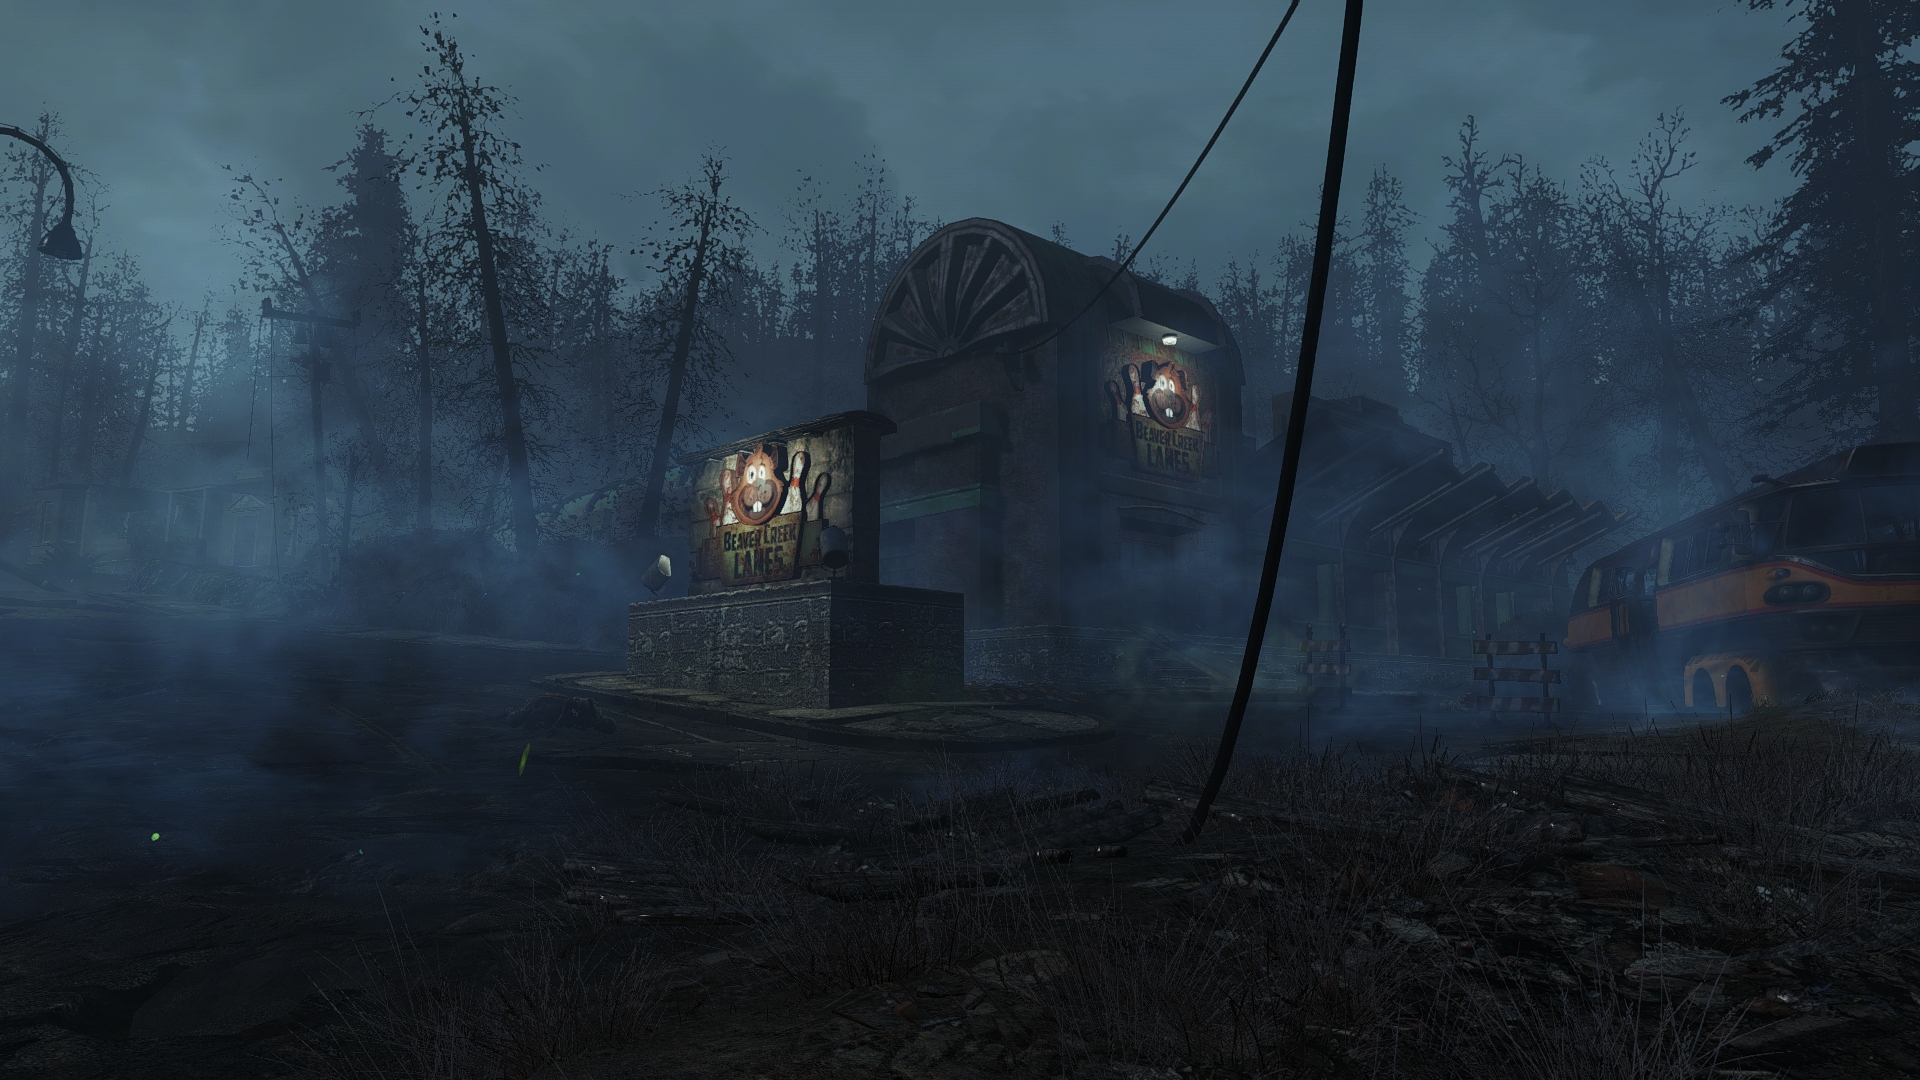 000827.Jpg - Fallout 4